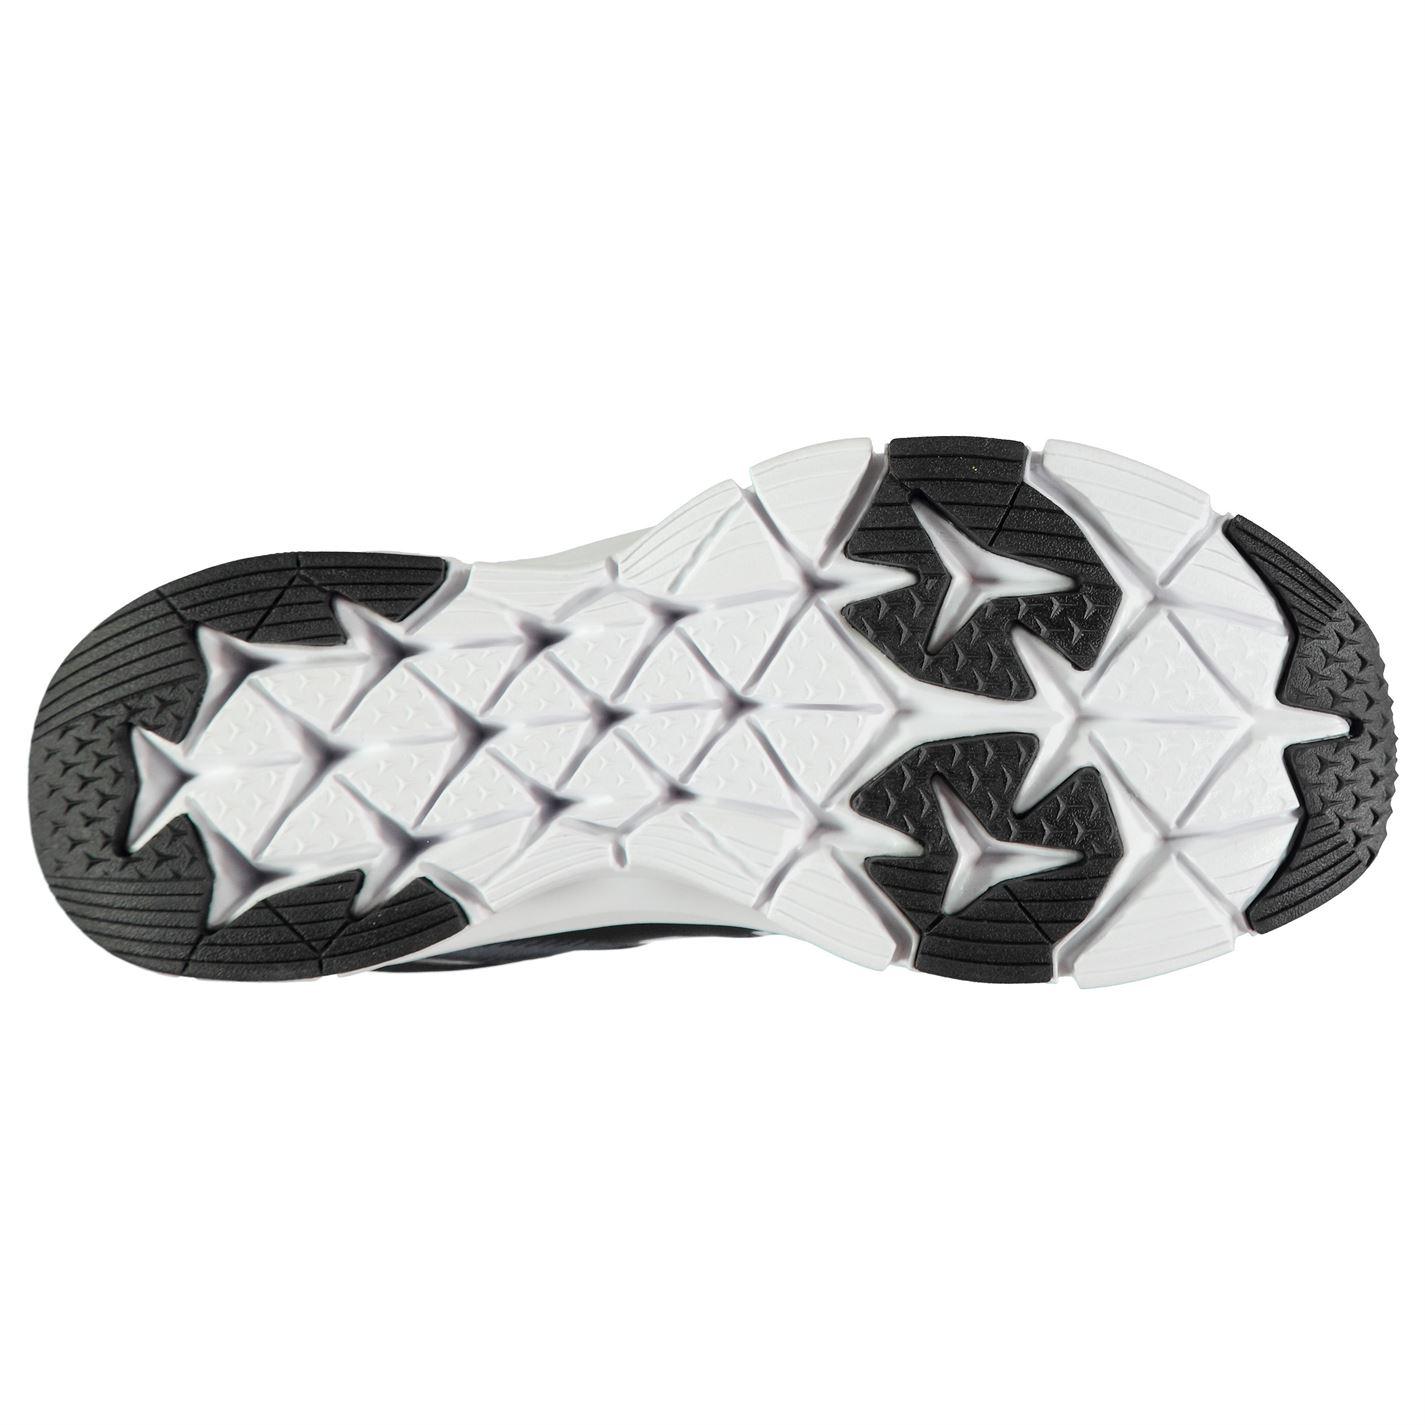 Tenis-New-Balance-RIFM-v1-para-hombre-Caballeros-De-Carretera-Zapatillas-Cordones-atados miniatura 7